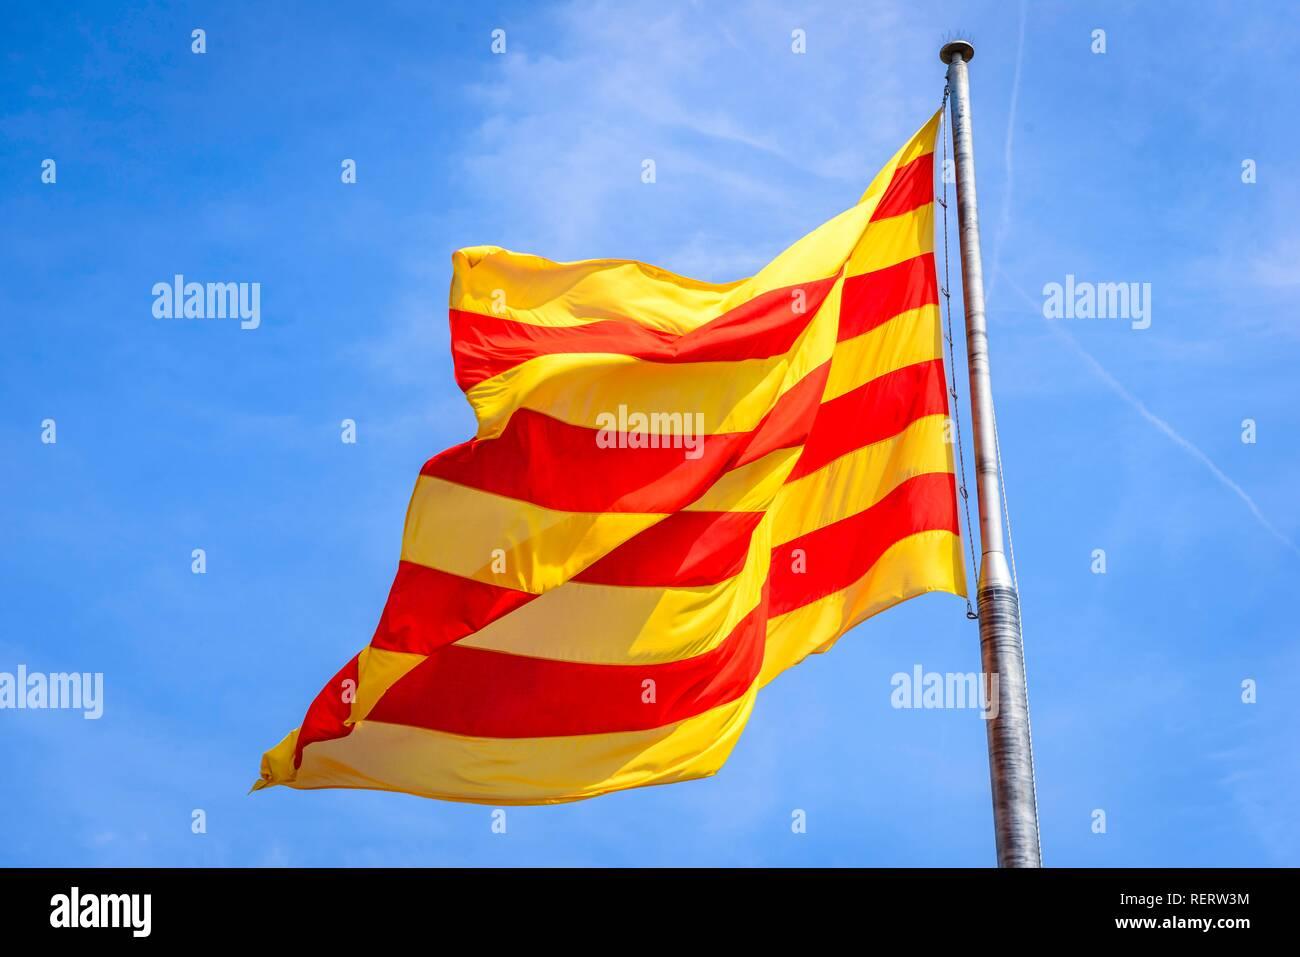 Barcelona Flag Imágenes De Stock   Barcelona Flag Fotos De Stock - Alamy 78296839e6d